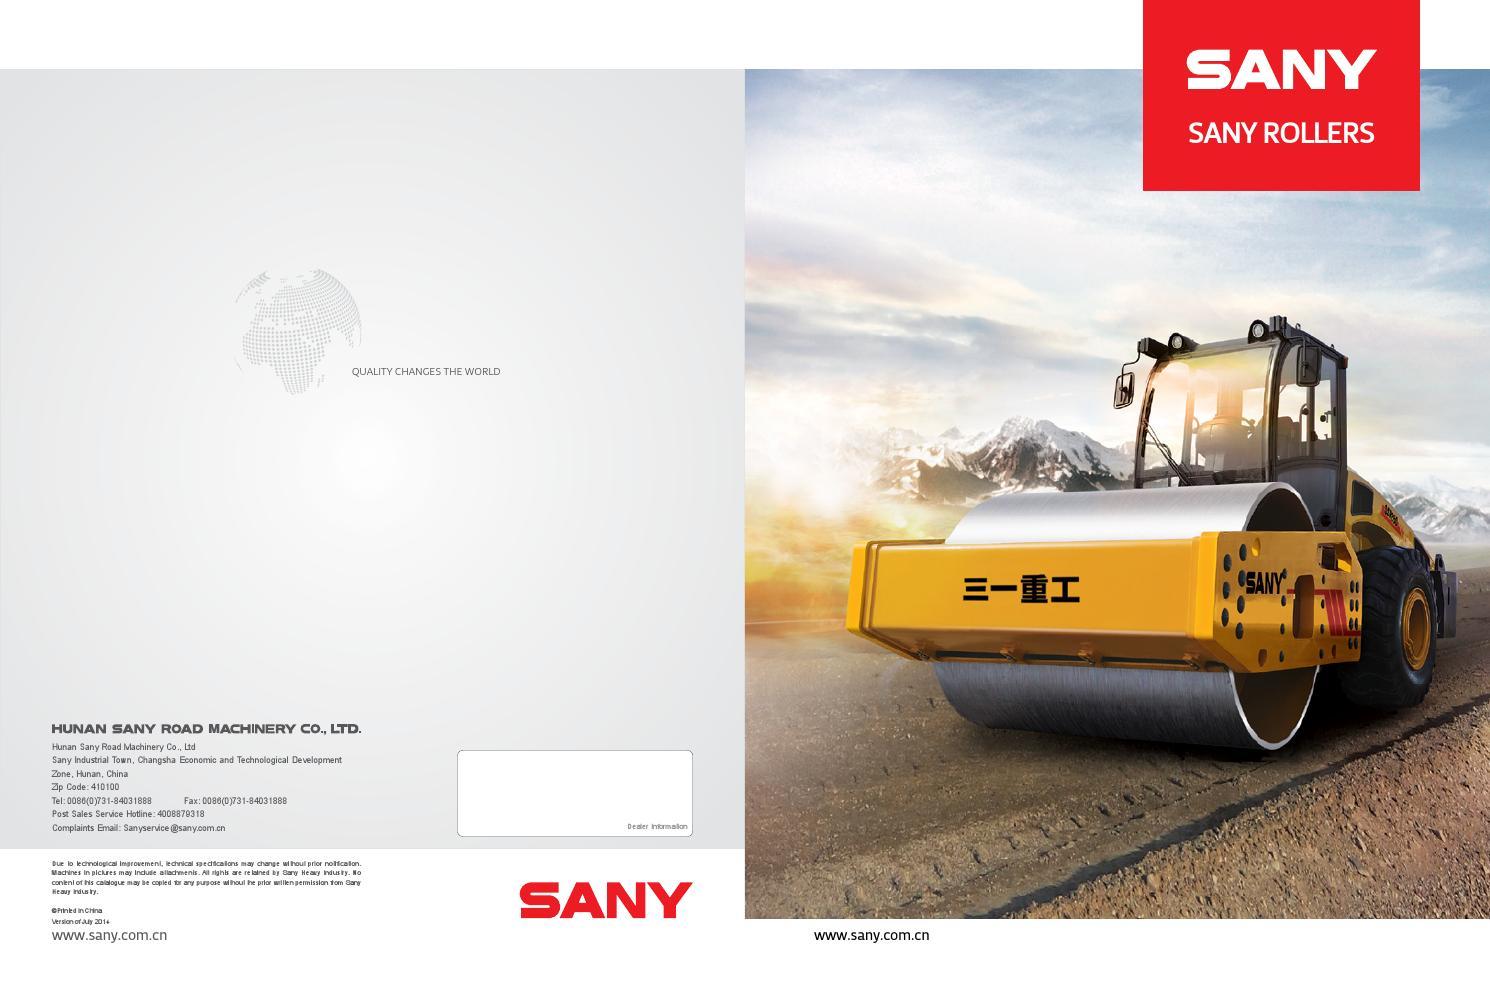 Sany cat logo compactadoras 2015 by jorge rodriguez sibaja issuu - Fax caser bajas ...